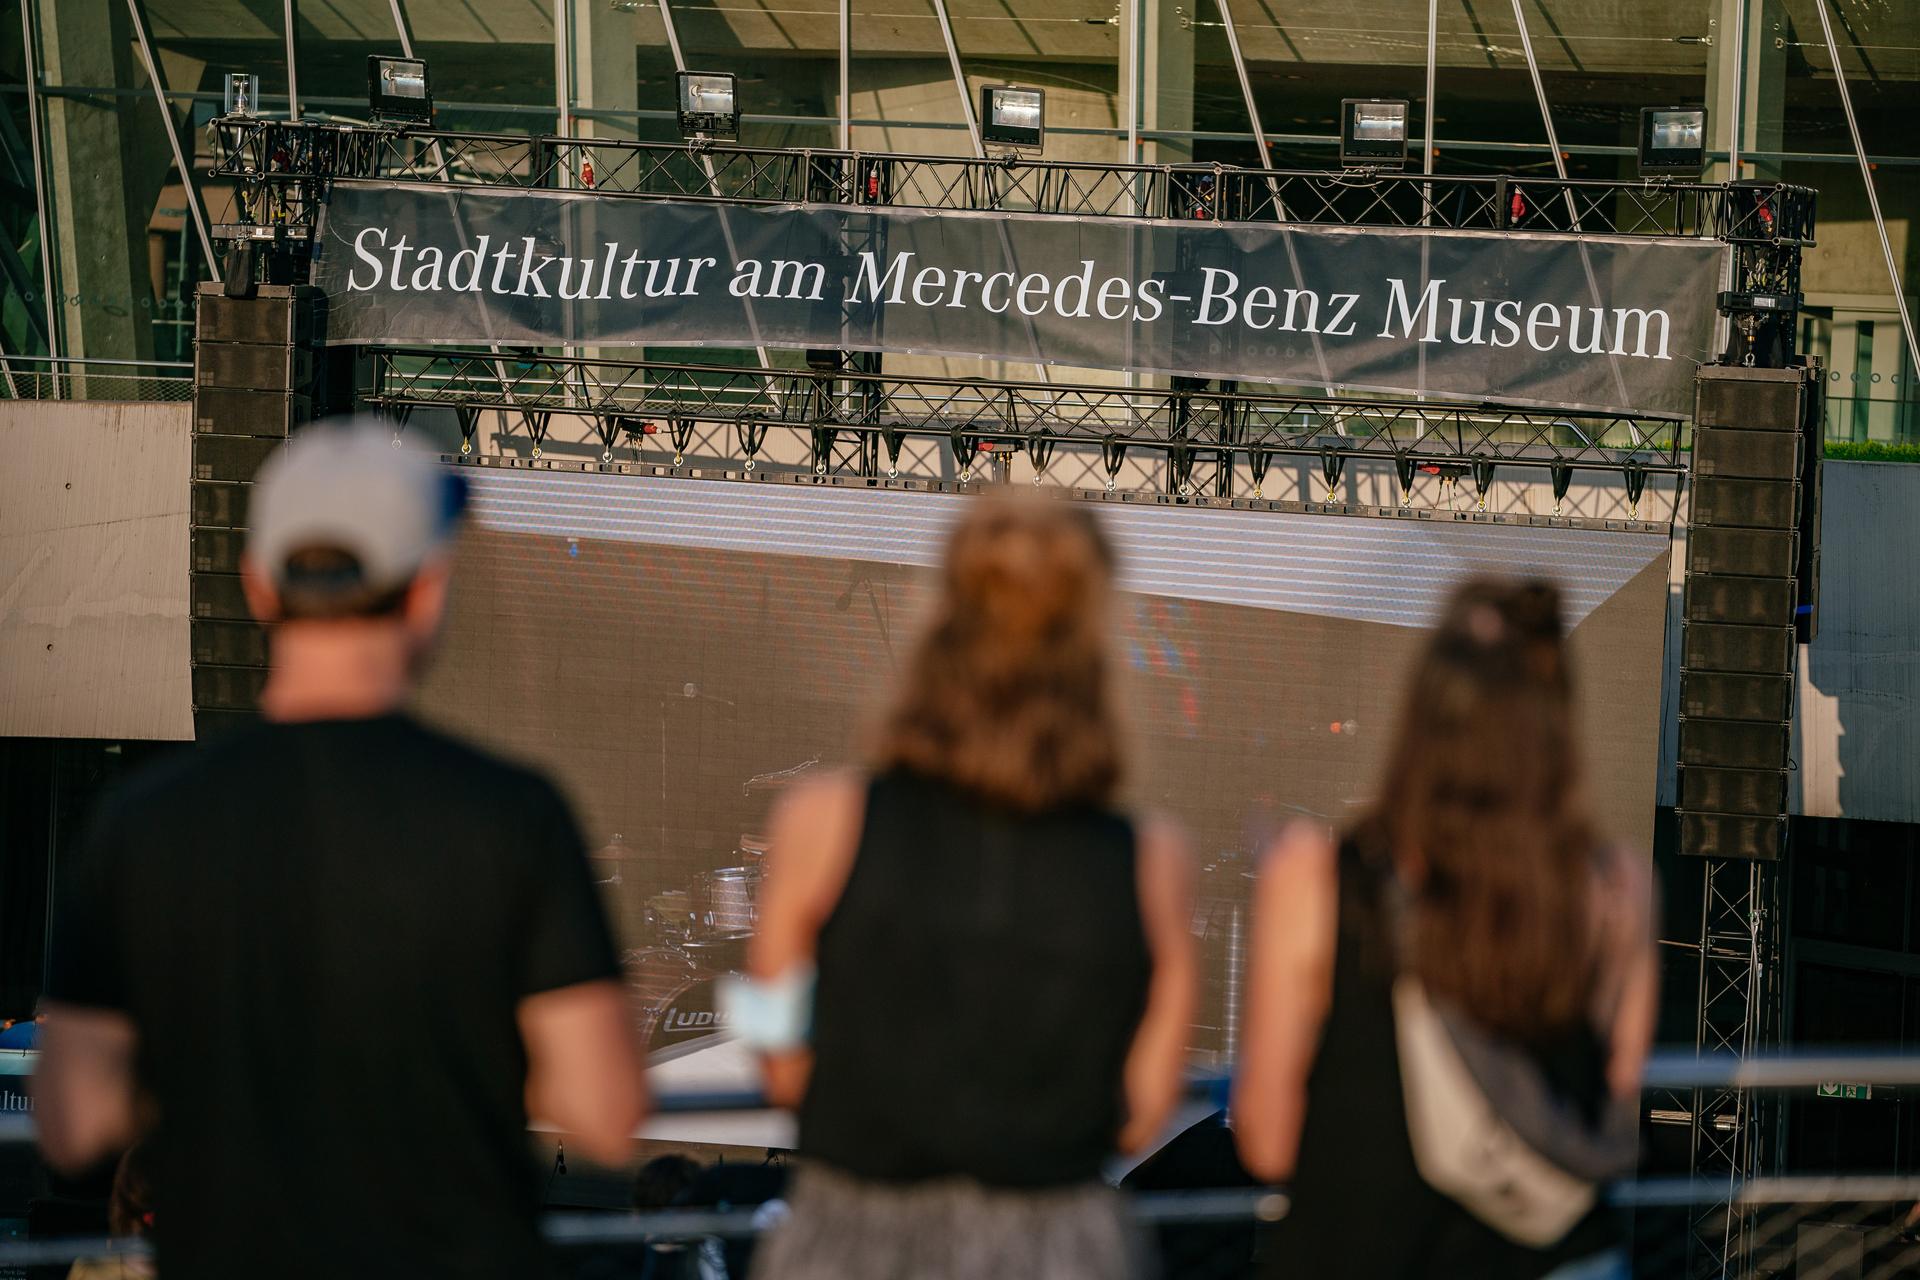 """Stadtkultur am Mercedes-Benz Museum"", Konzert von Carsten Meyer & Lucas Kochbeck am 18. Juli 2021 auf der Open Air Bühne am Museum."